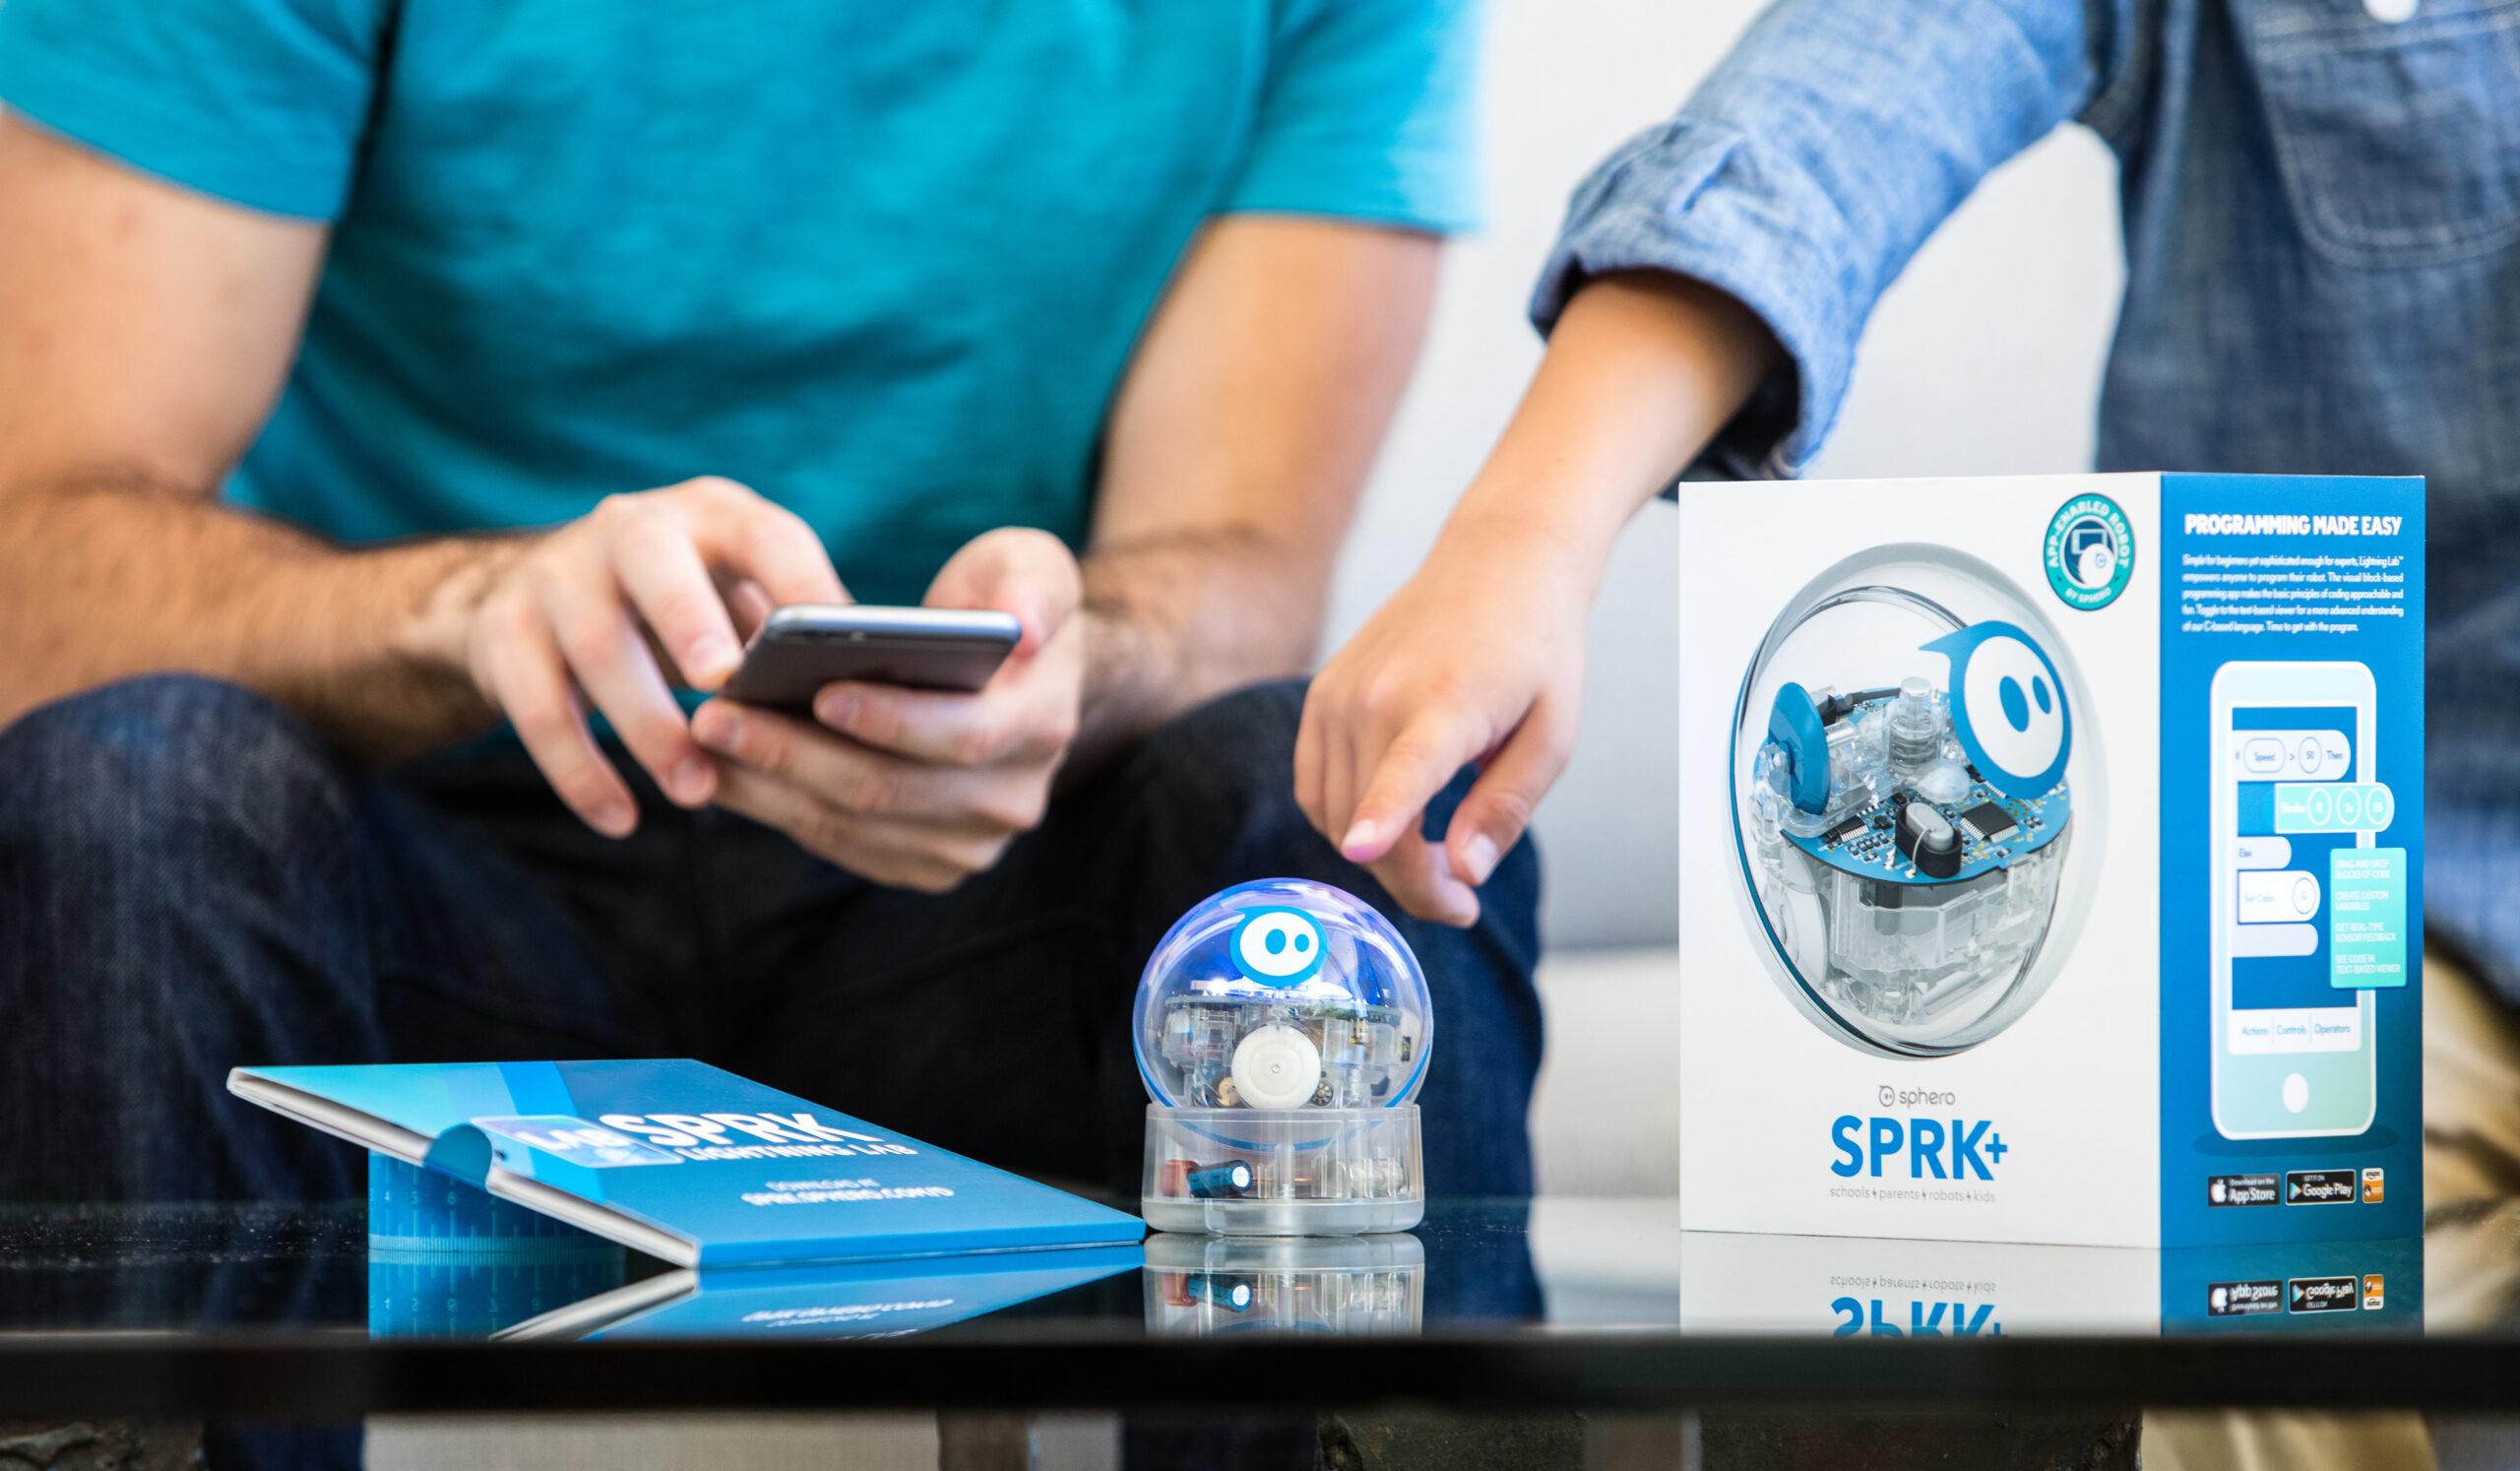 Inspire Curiosity, Creativity and Innovation With the Sphero SPRK+